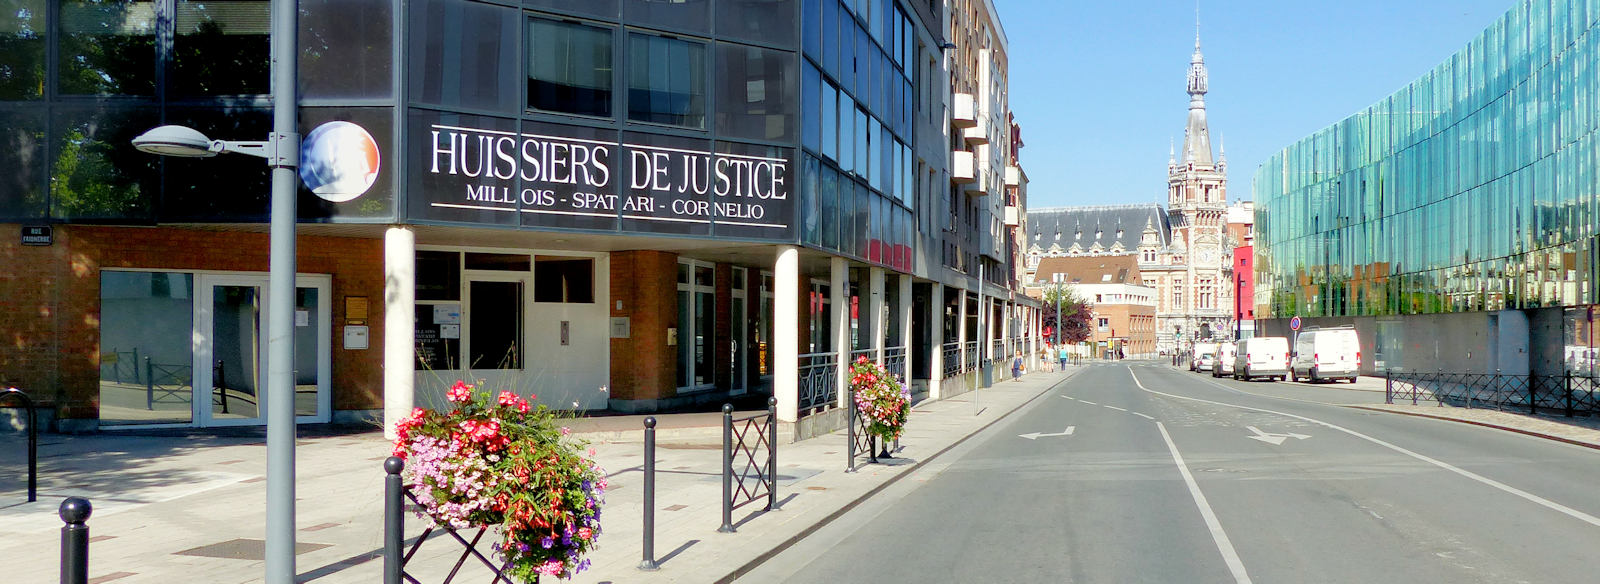 Huissiers de Justice Tourcoing - Millois, Spatari, Cornelio